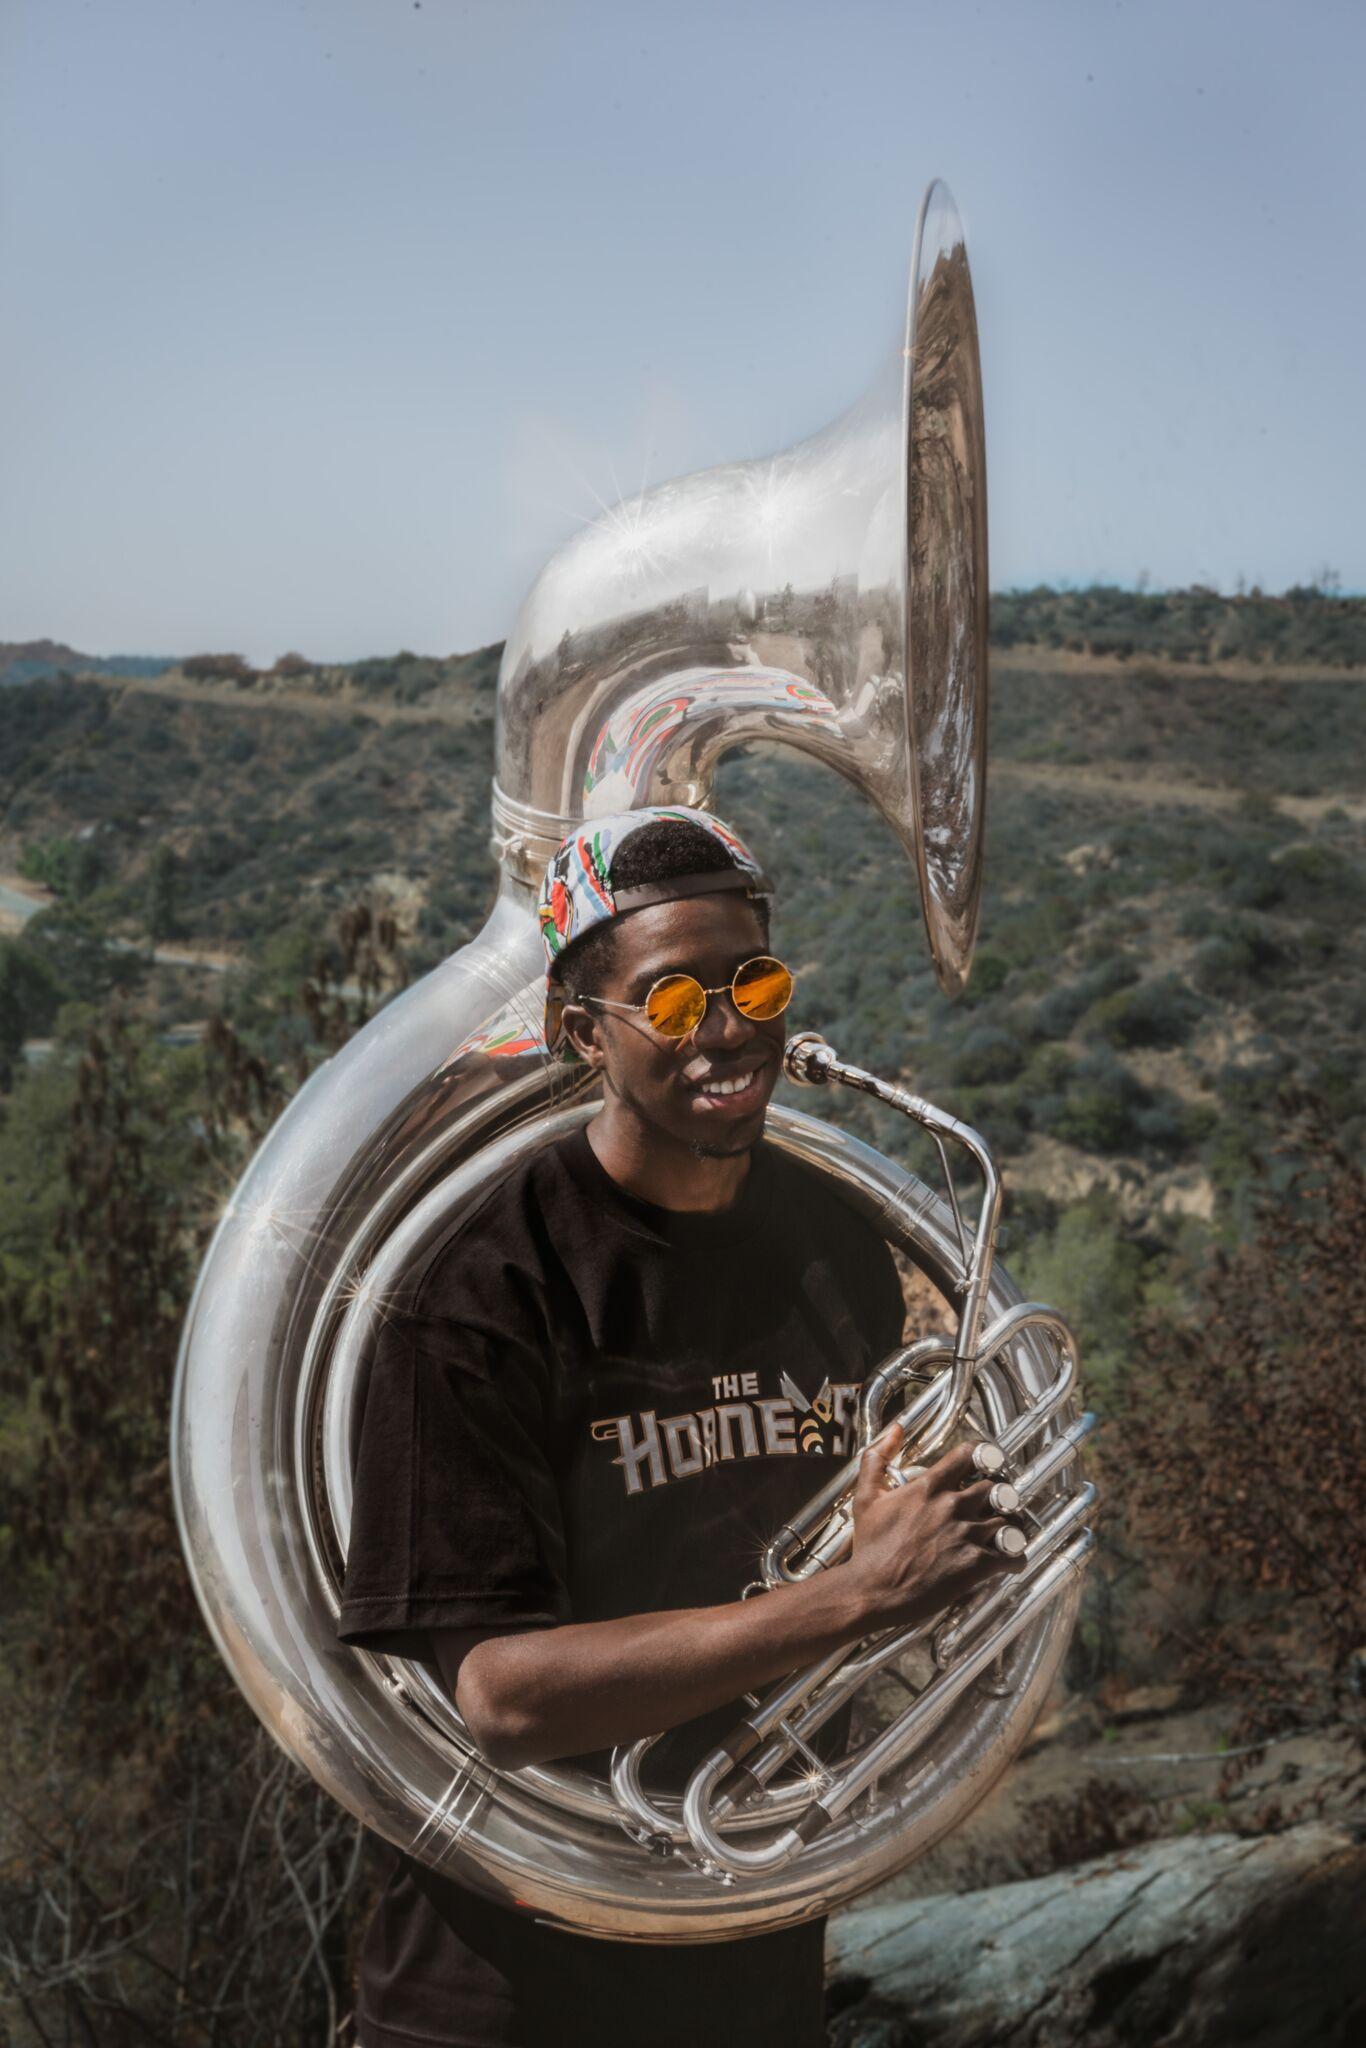 Hornets_headshot2